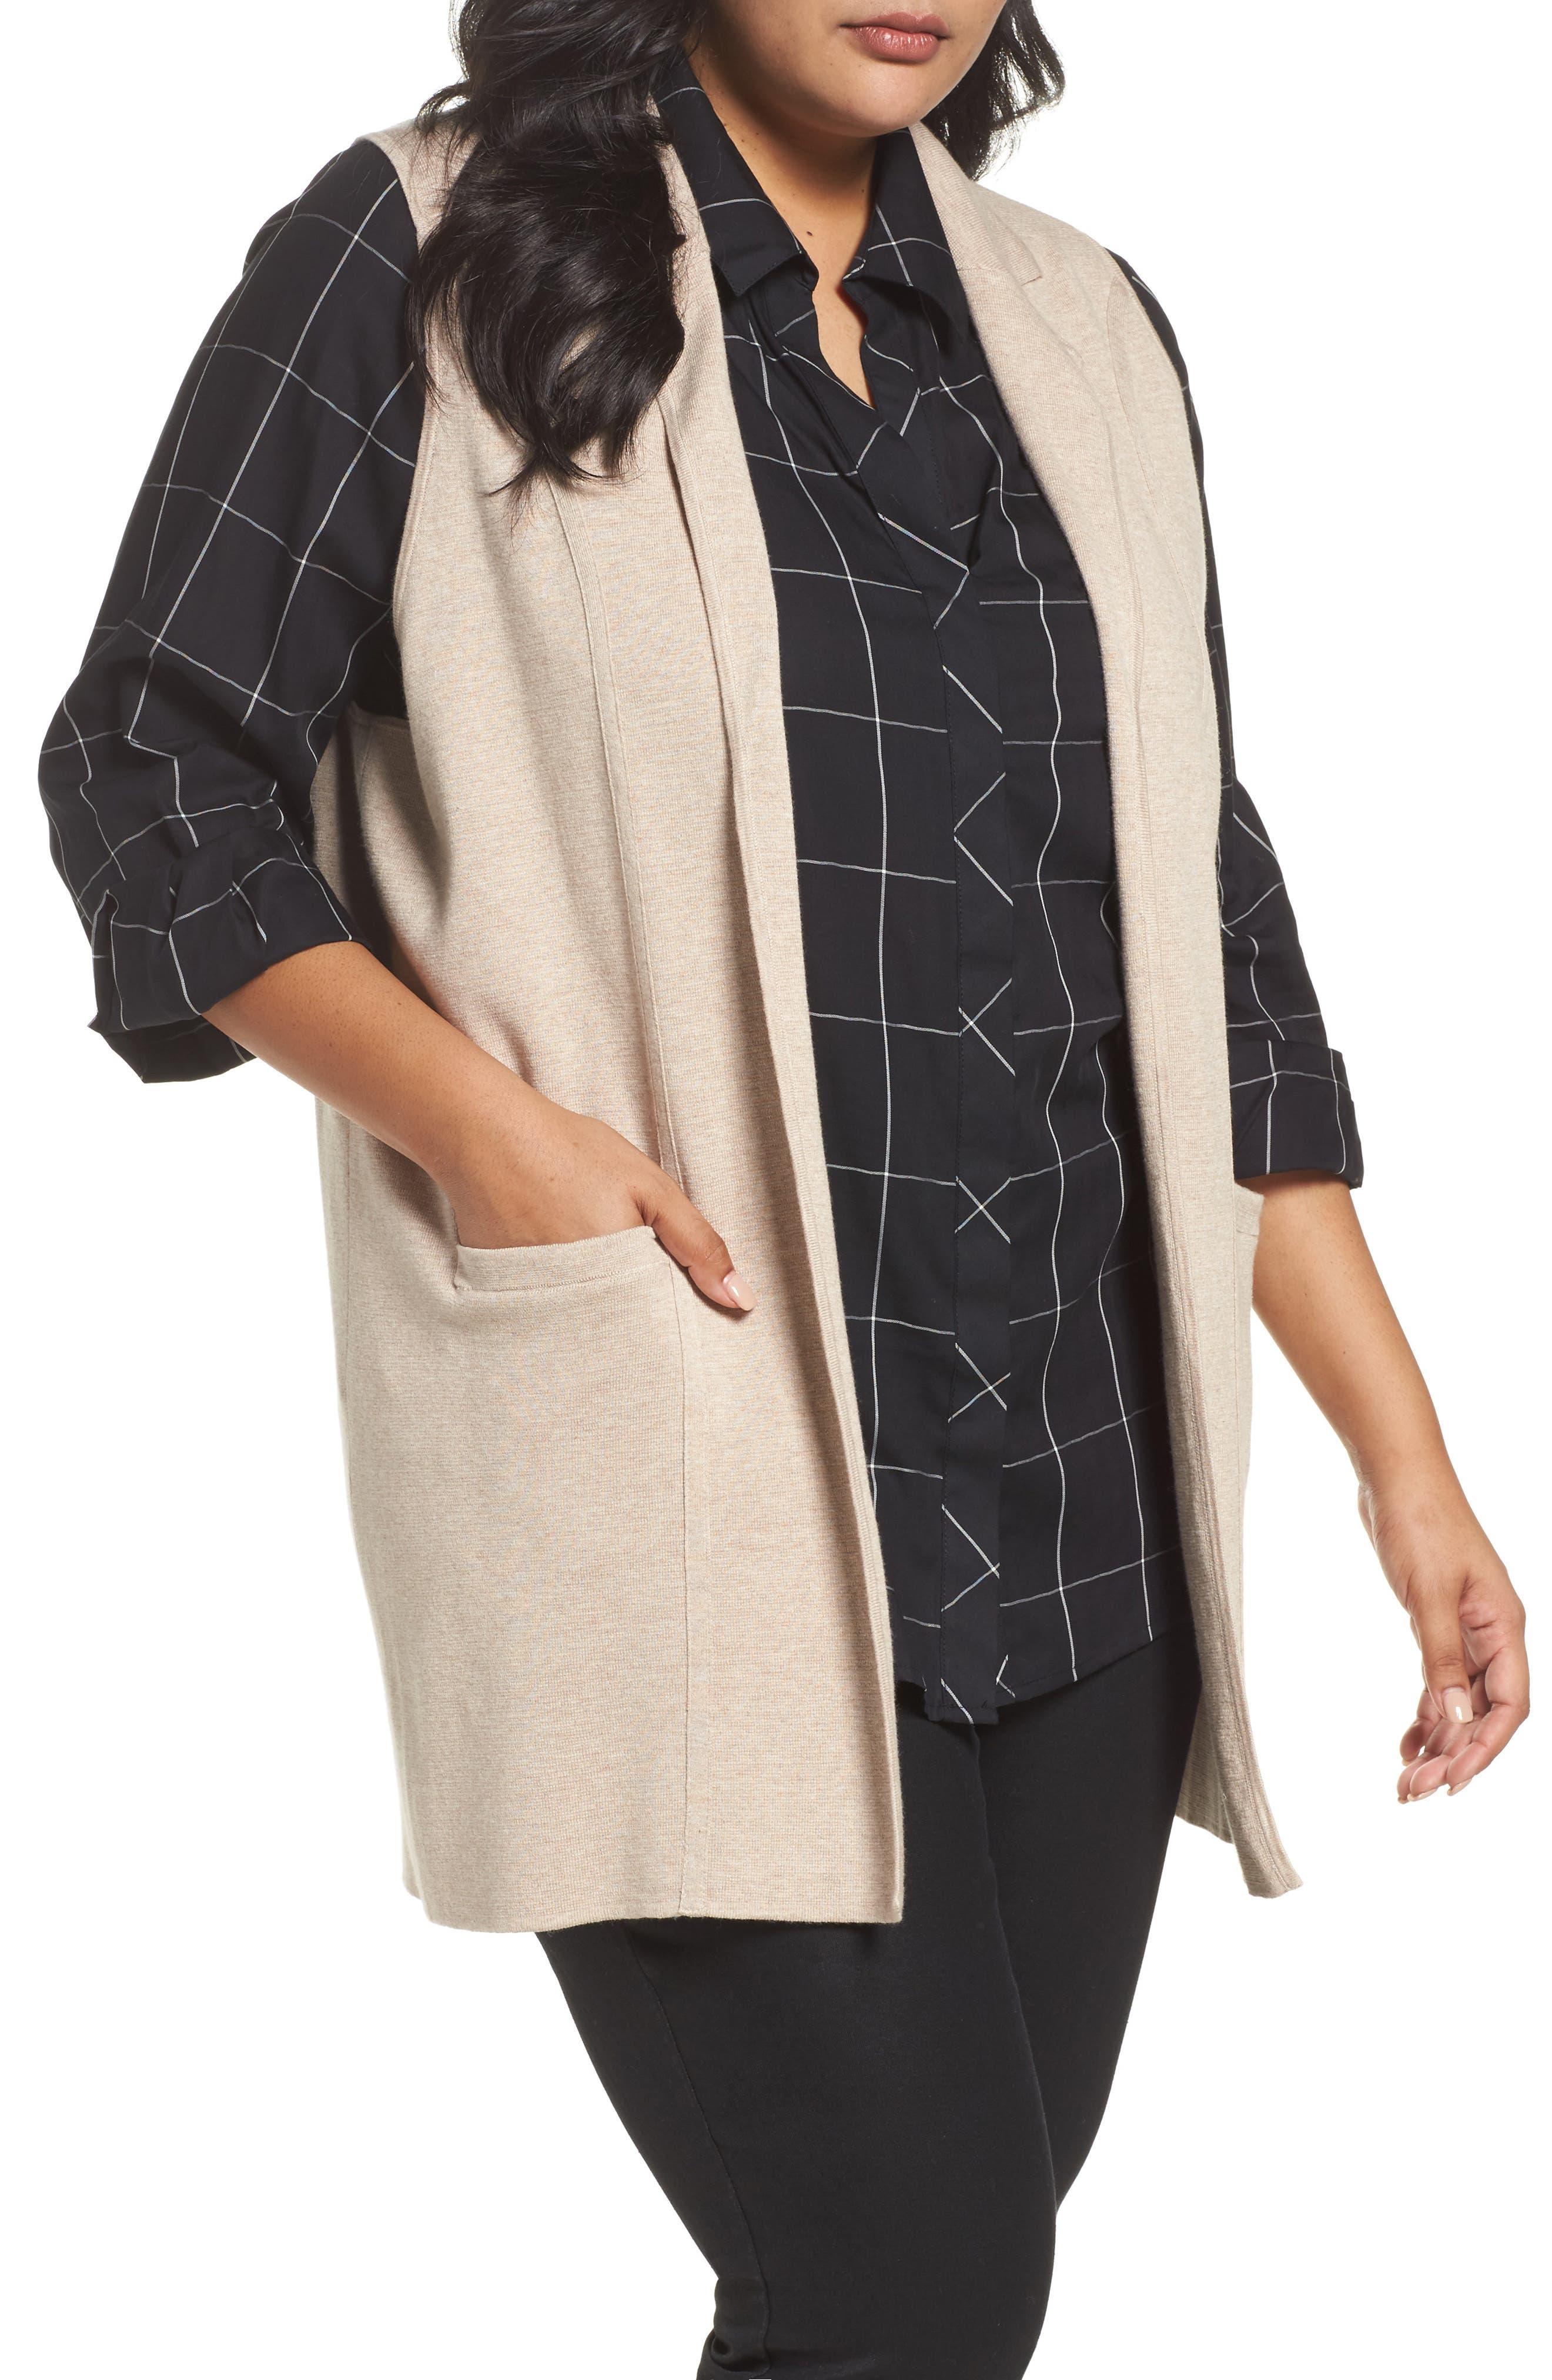 Vintage Sweaters: Cable Knit, Fair Isle Cardigans & Sweaters Plus Size Womens Foxcroft Jodi Longline Sweater Vest $96.00 AT vintagedancer.com